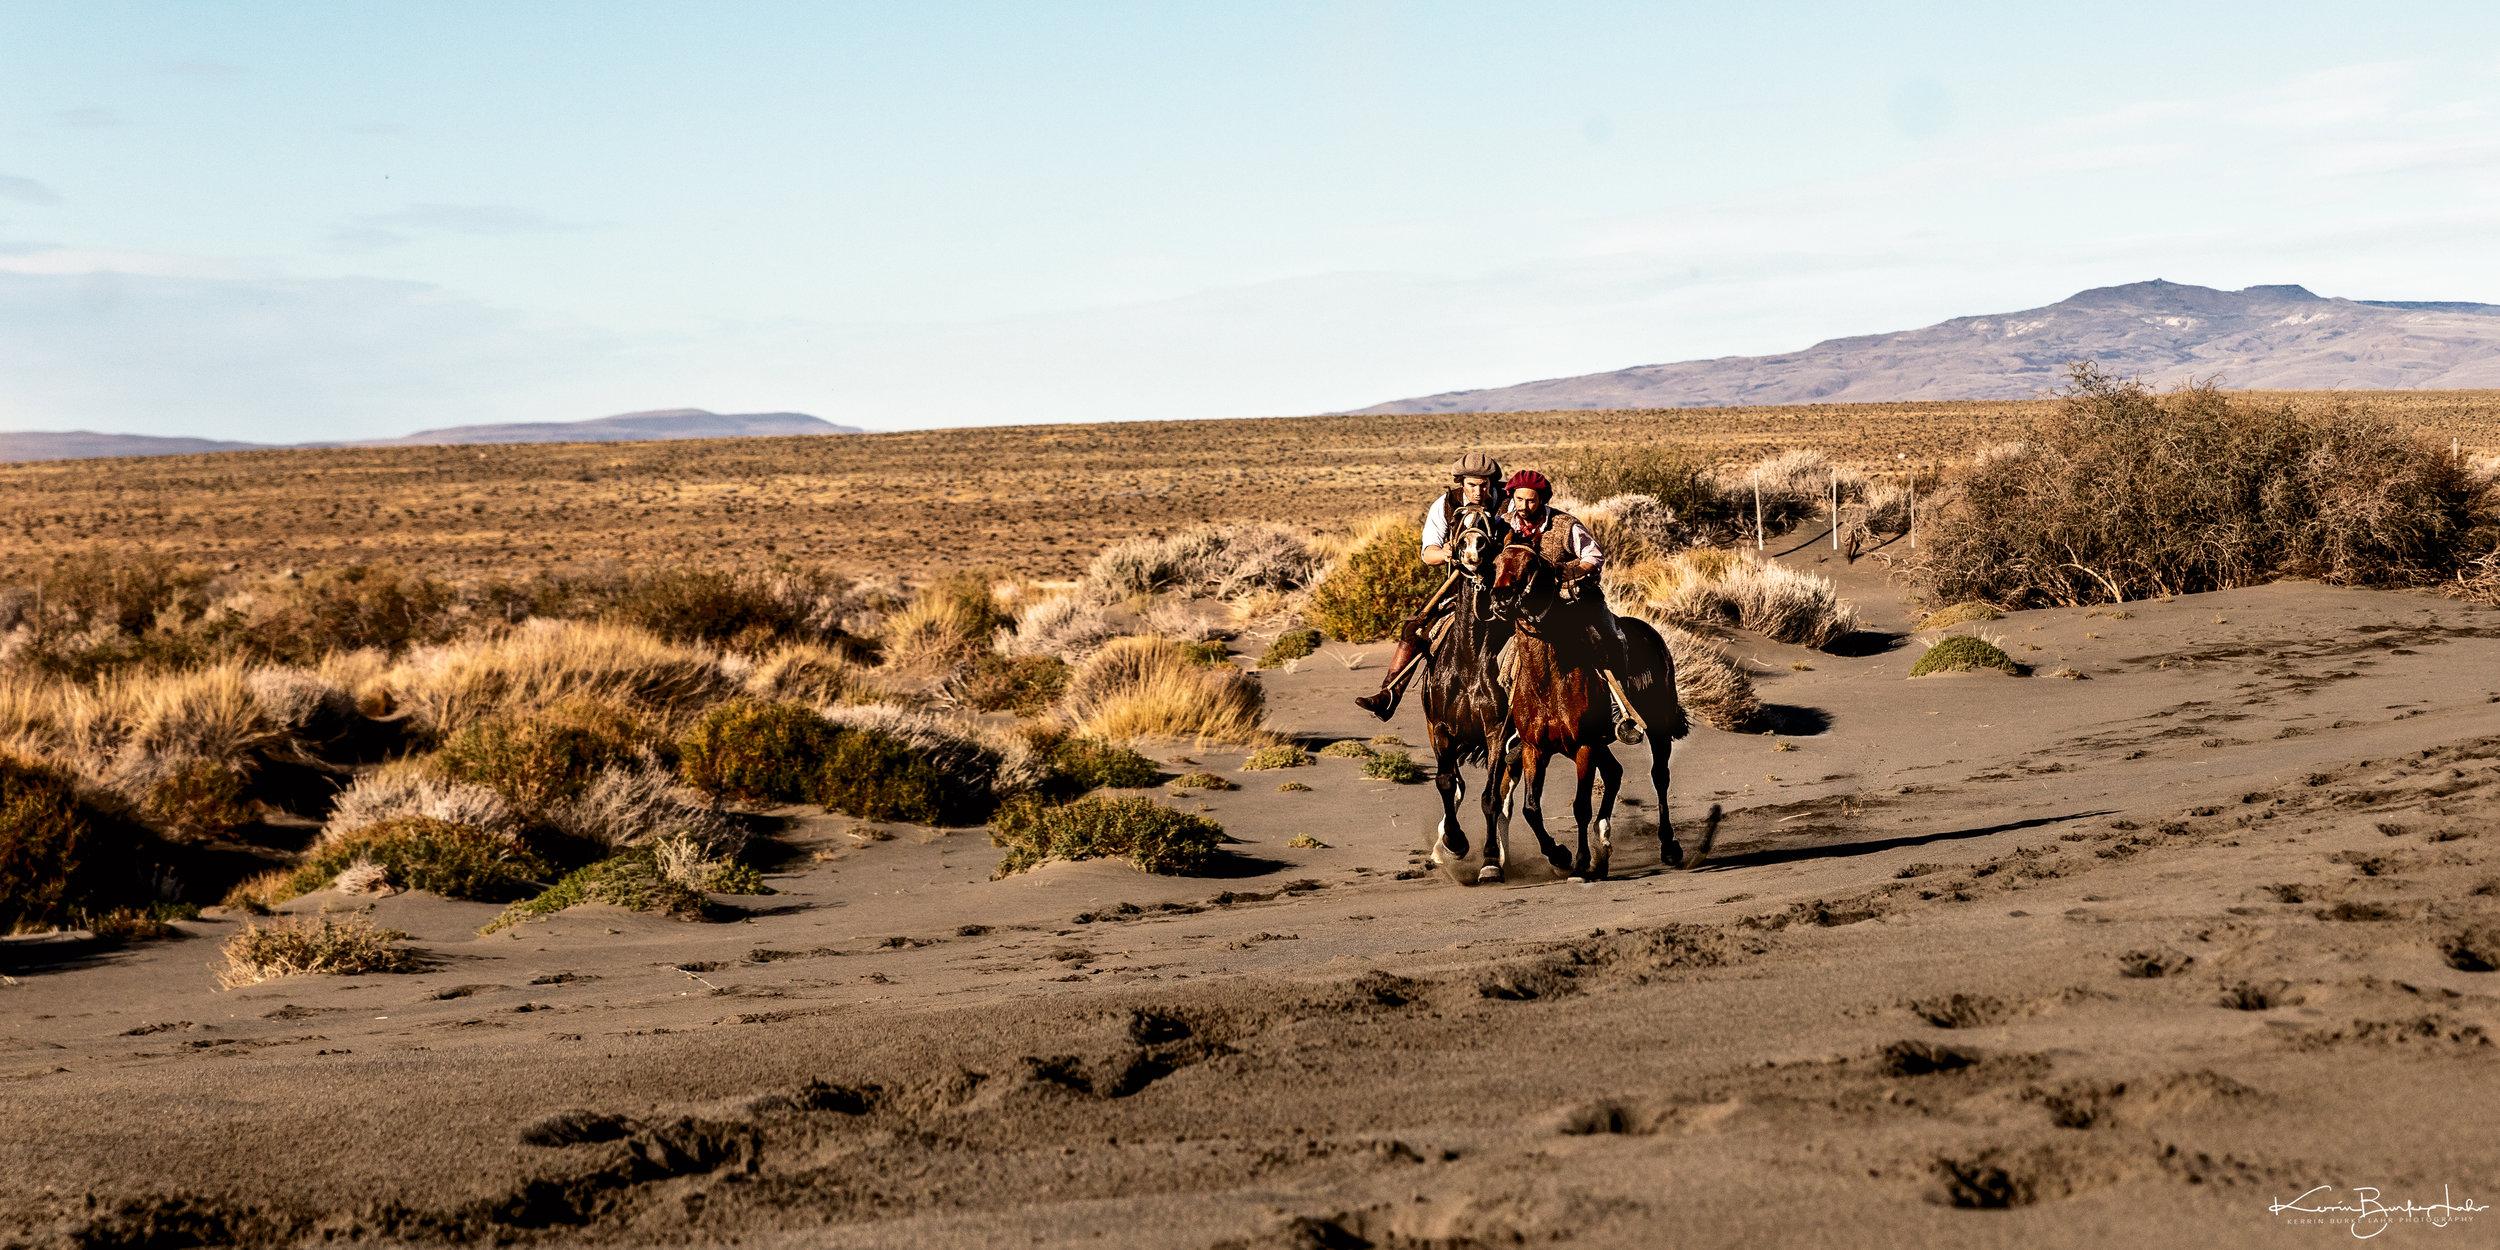 Patagonia-4-7-2019-682-Recovered.jpg